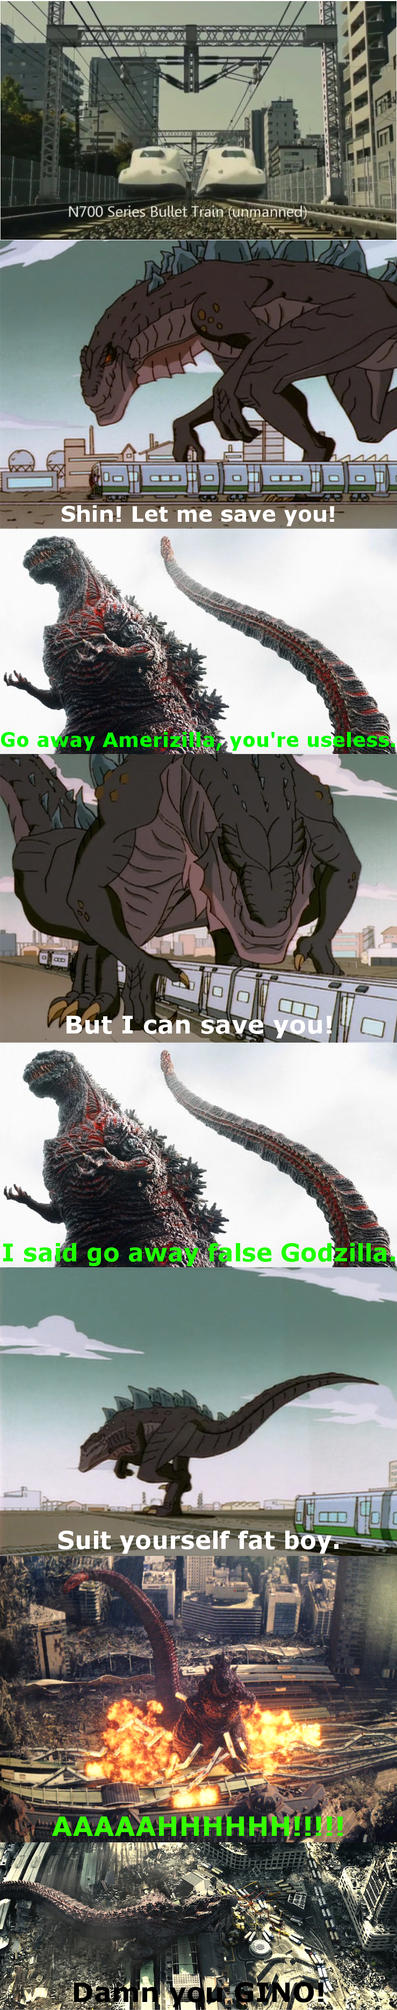 Shin vs. American Godzilla by Mechaghostman2